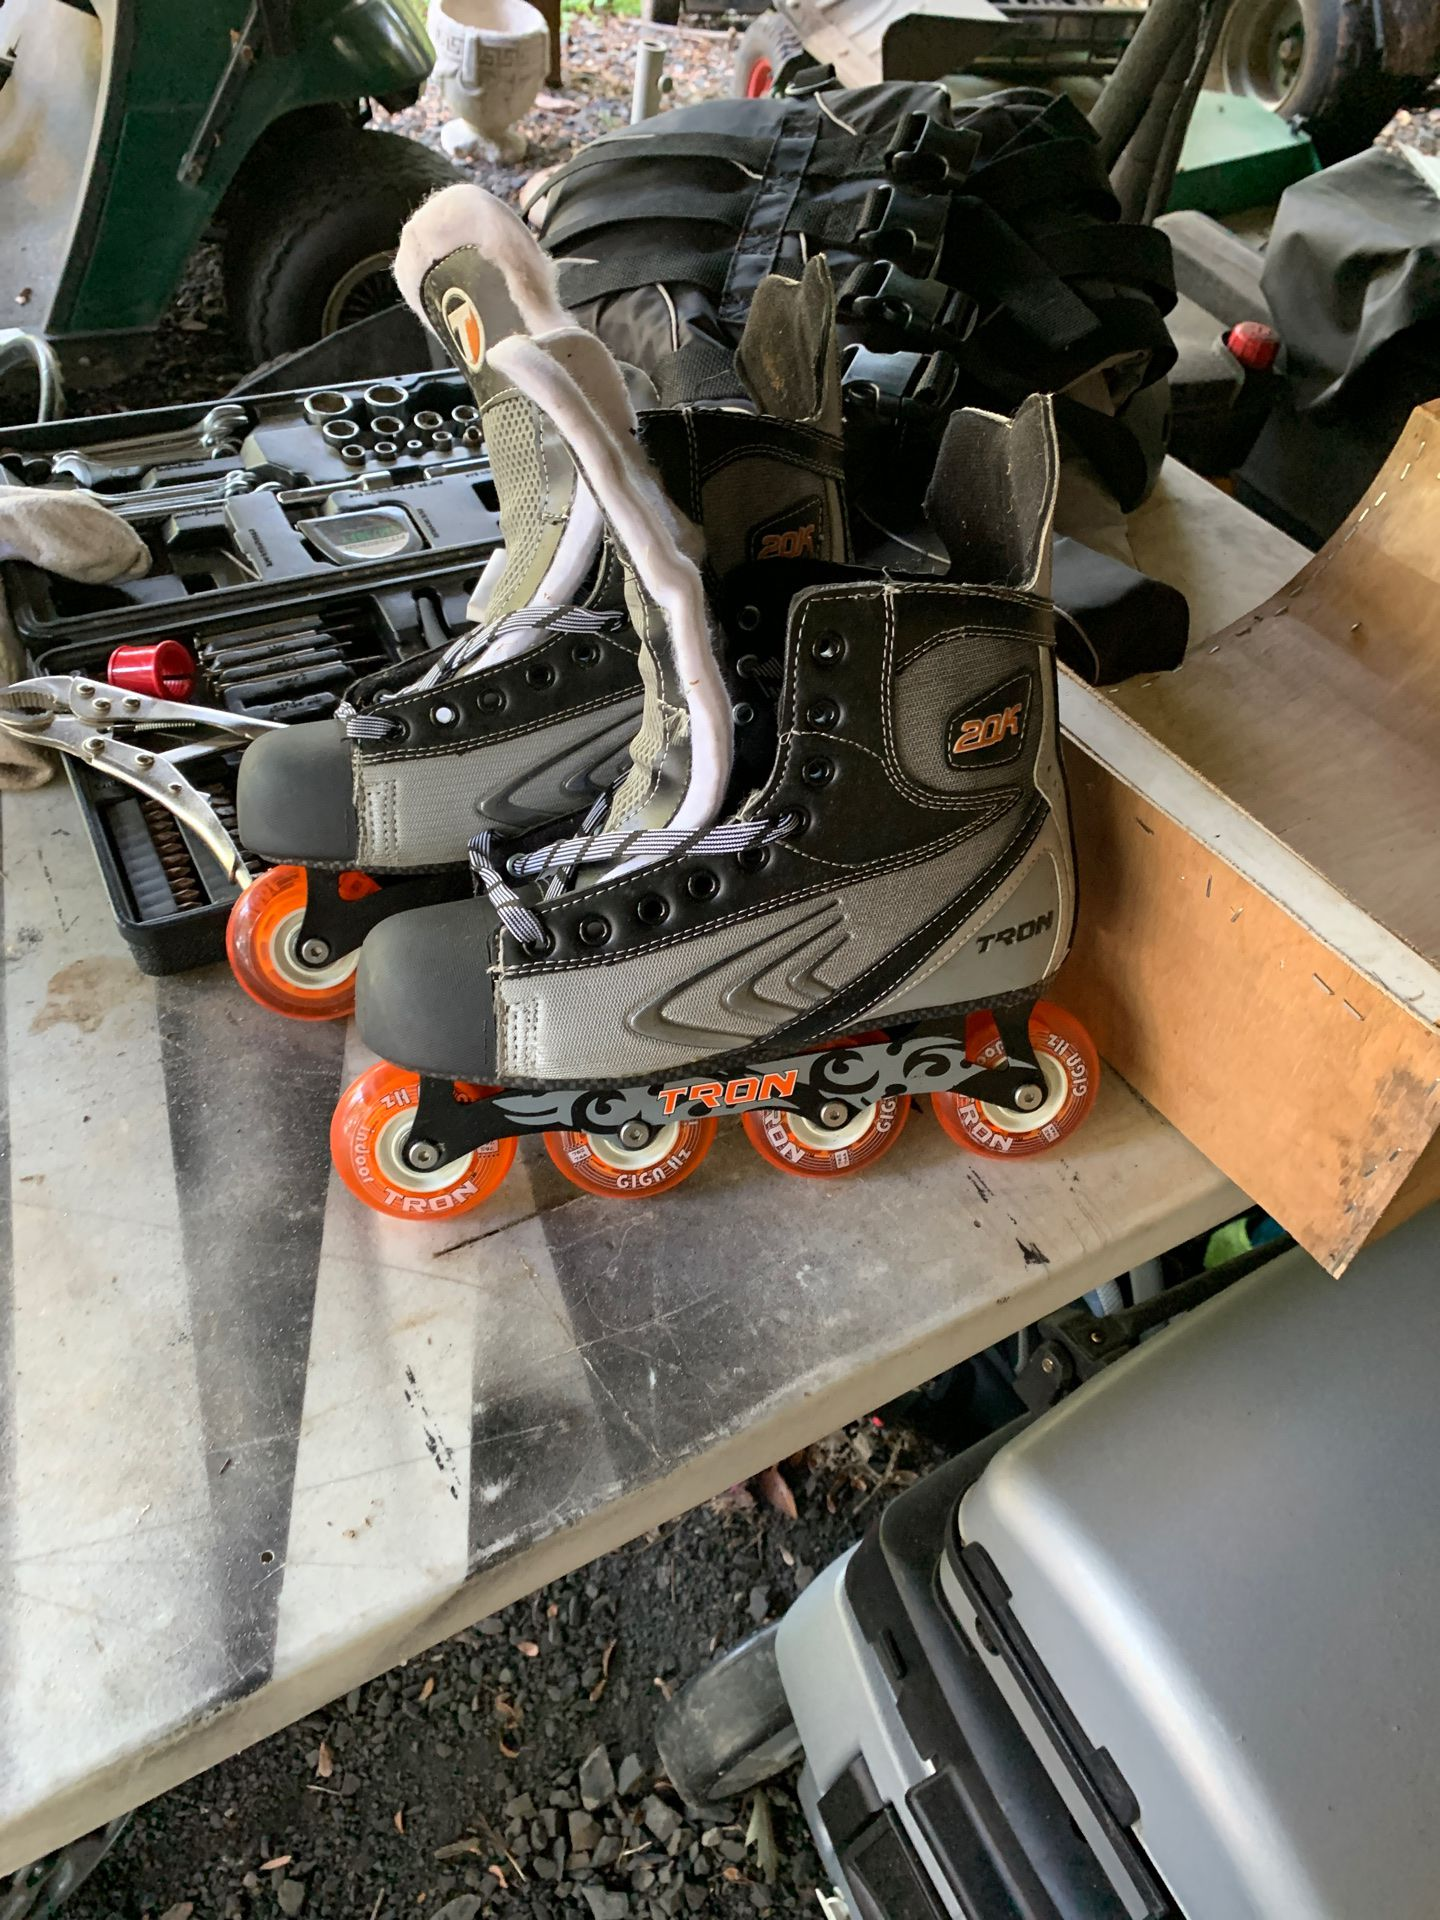 Tron roller hockey skates size 10 1/2